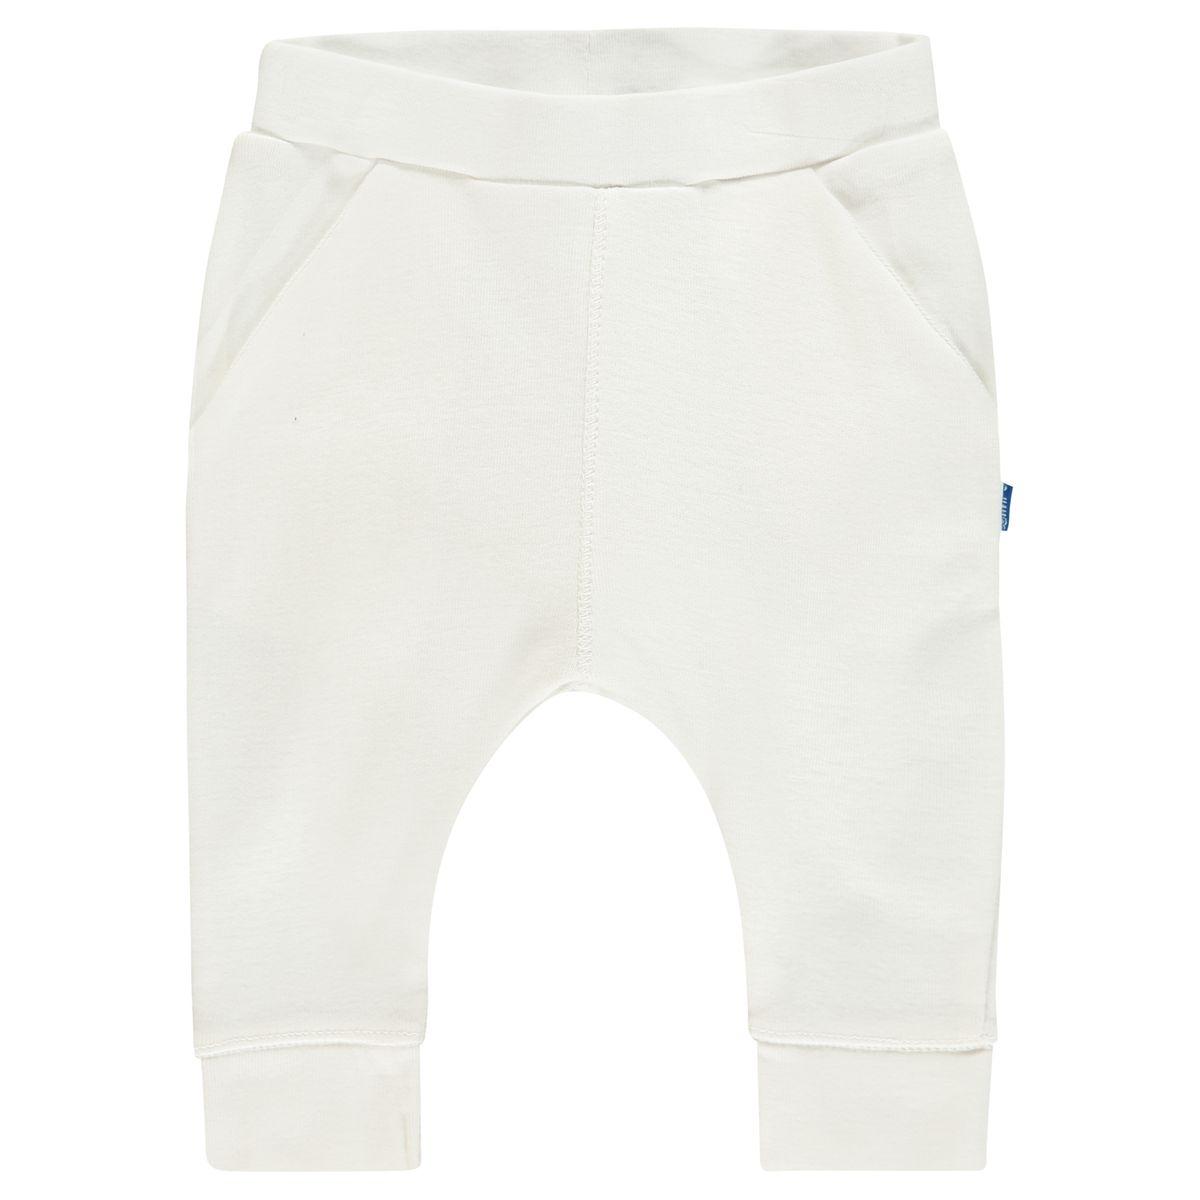 Pantalon Lux Solid